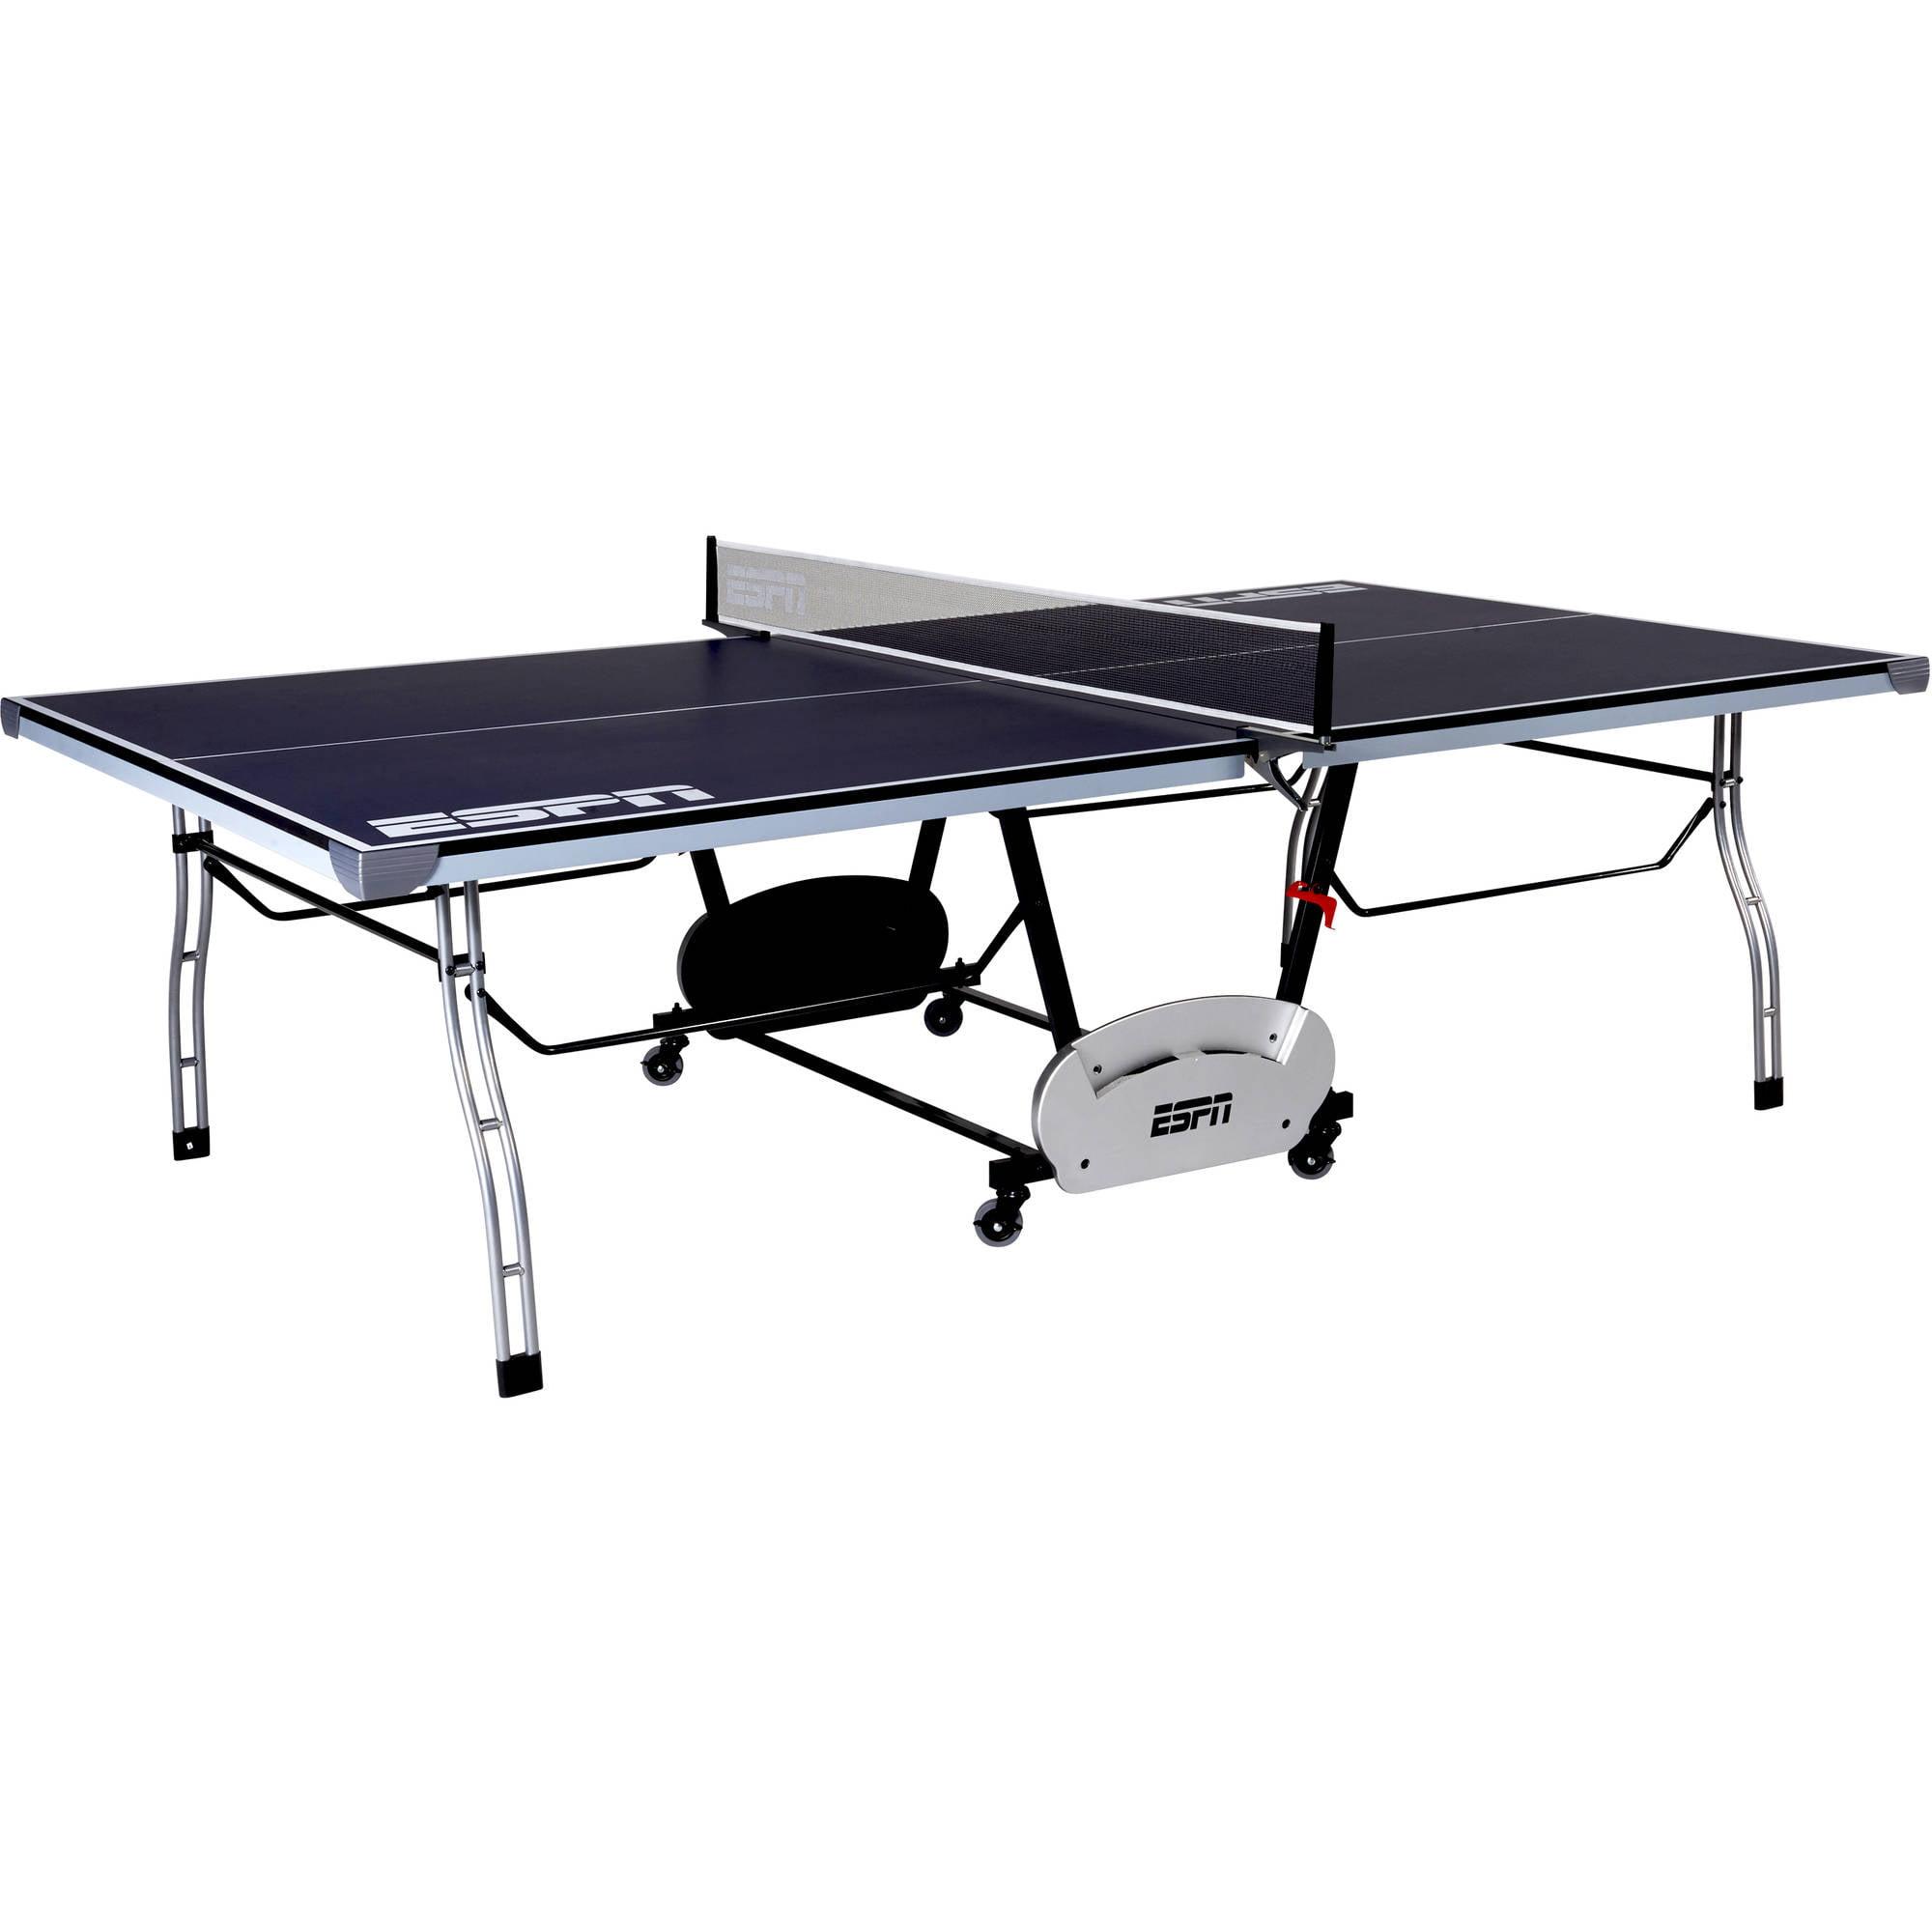 ESPN 4-Piece Table Tennis Table (Box 1 of 2)